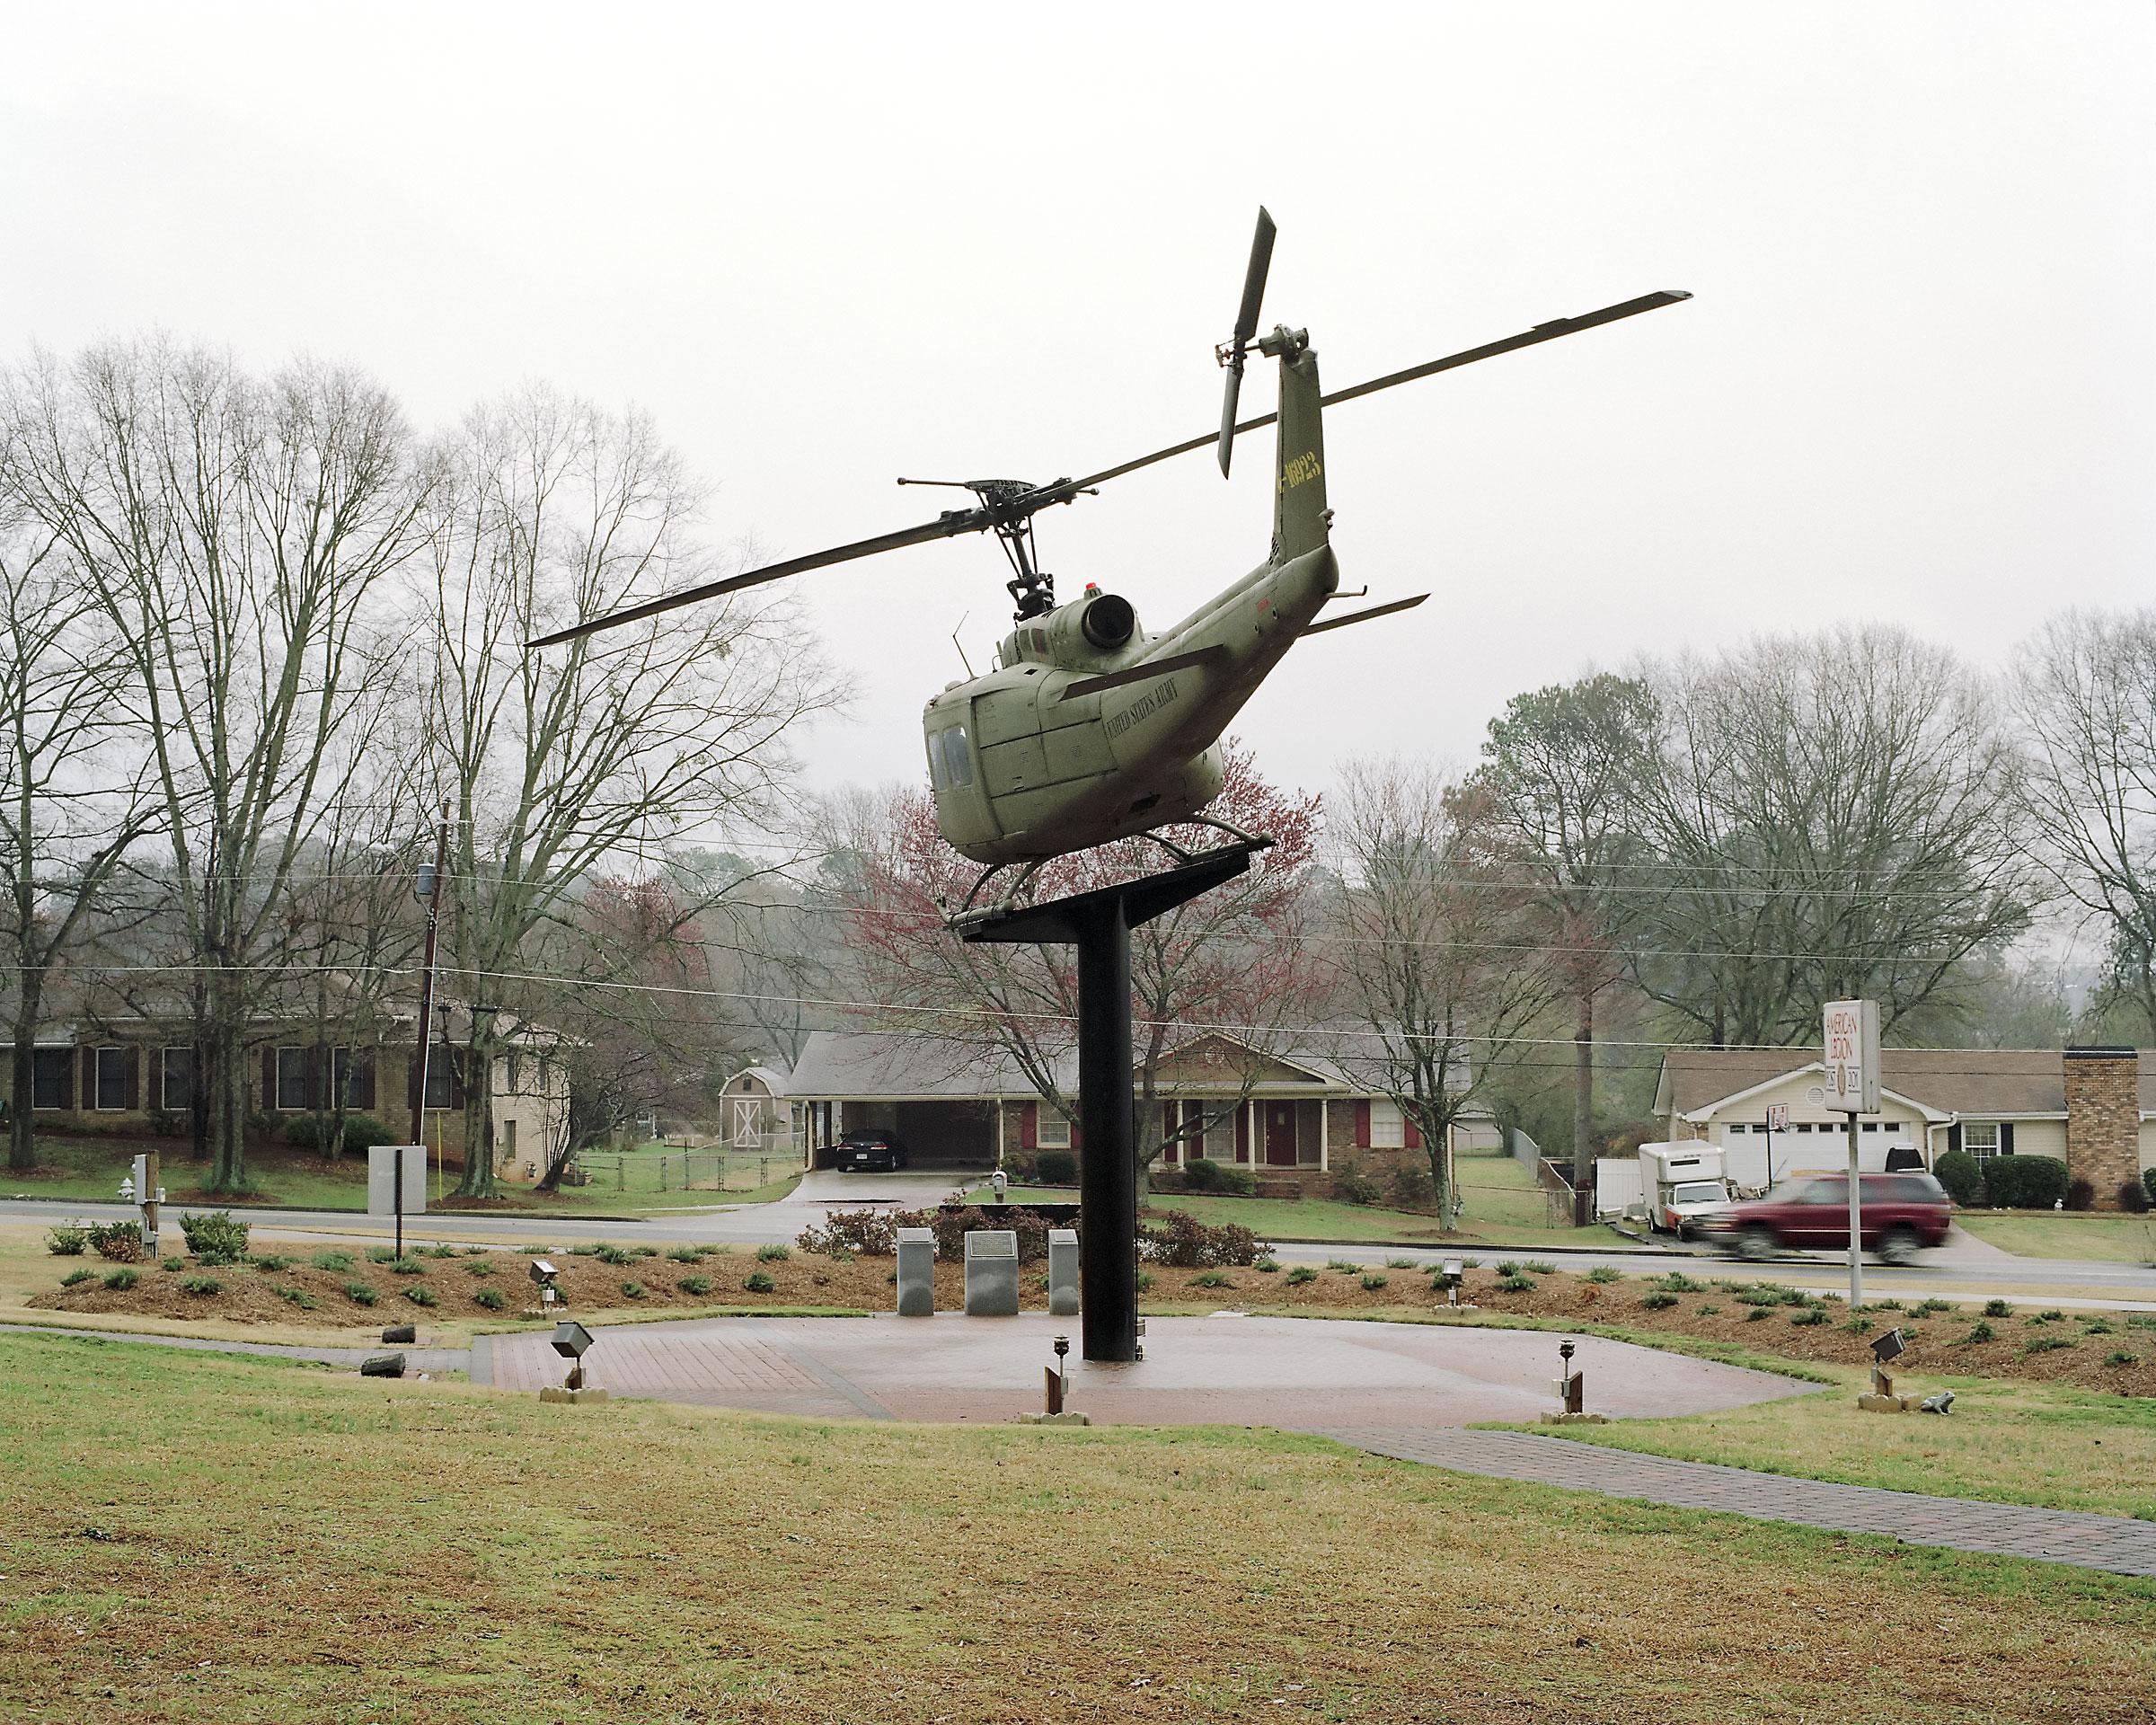 UH-1H Huey helicopter, American Legion Post 201, Alpharetta, Georgia 2008.